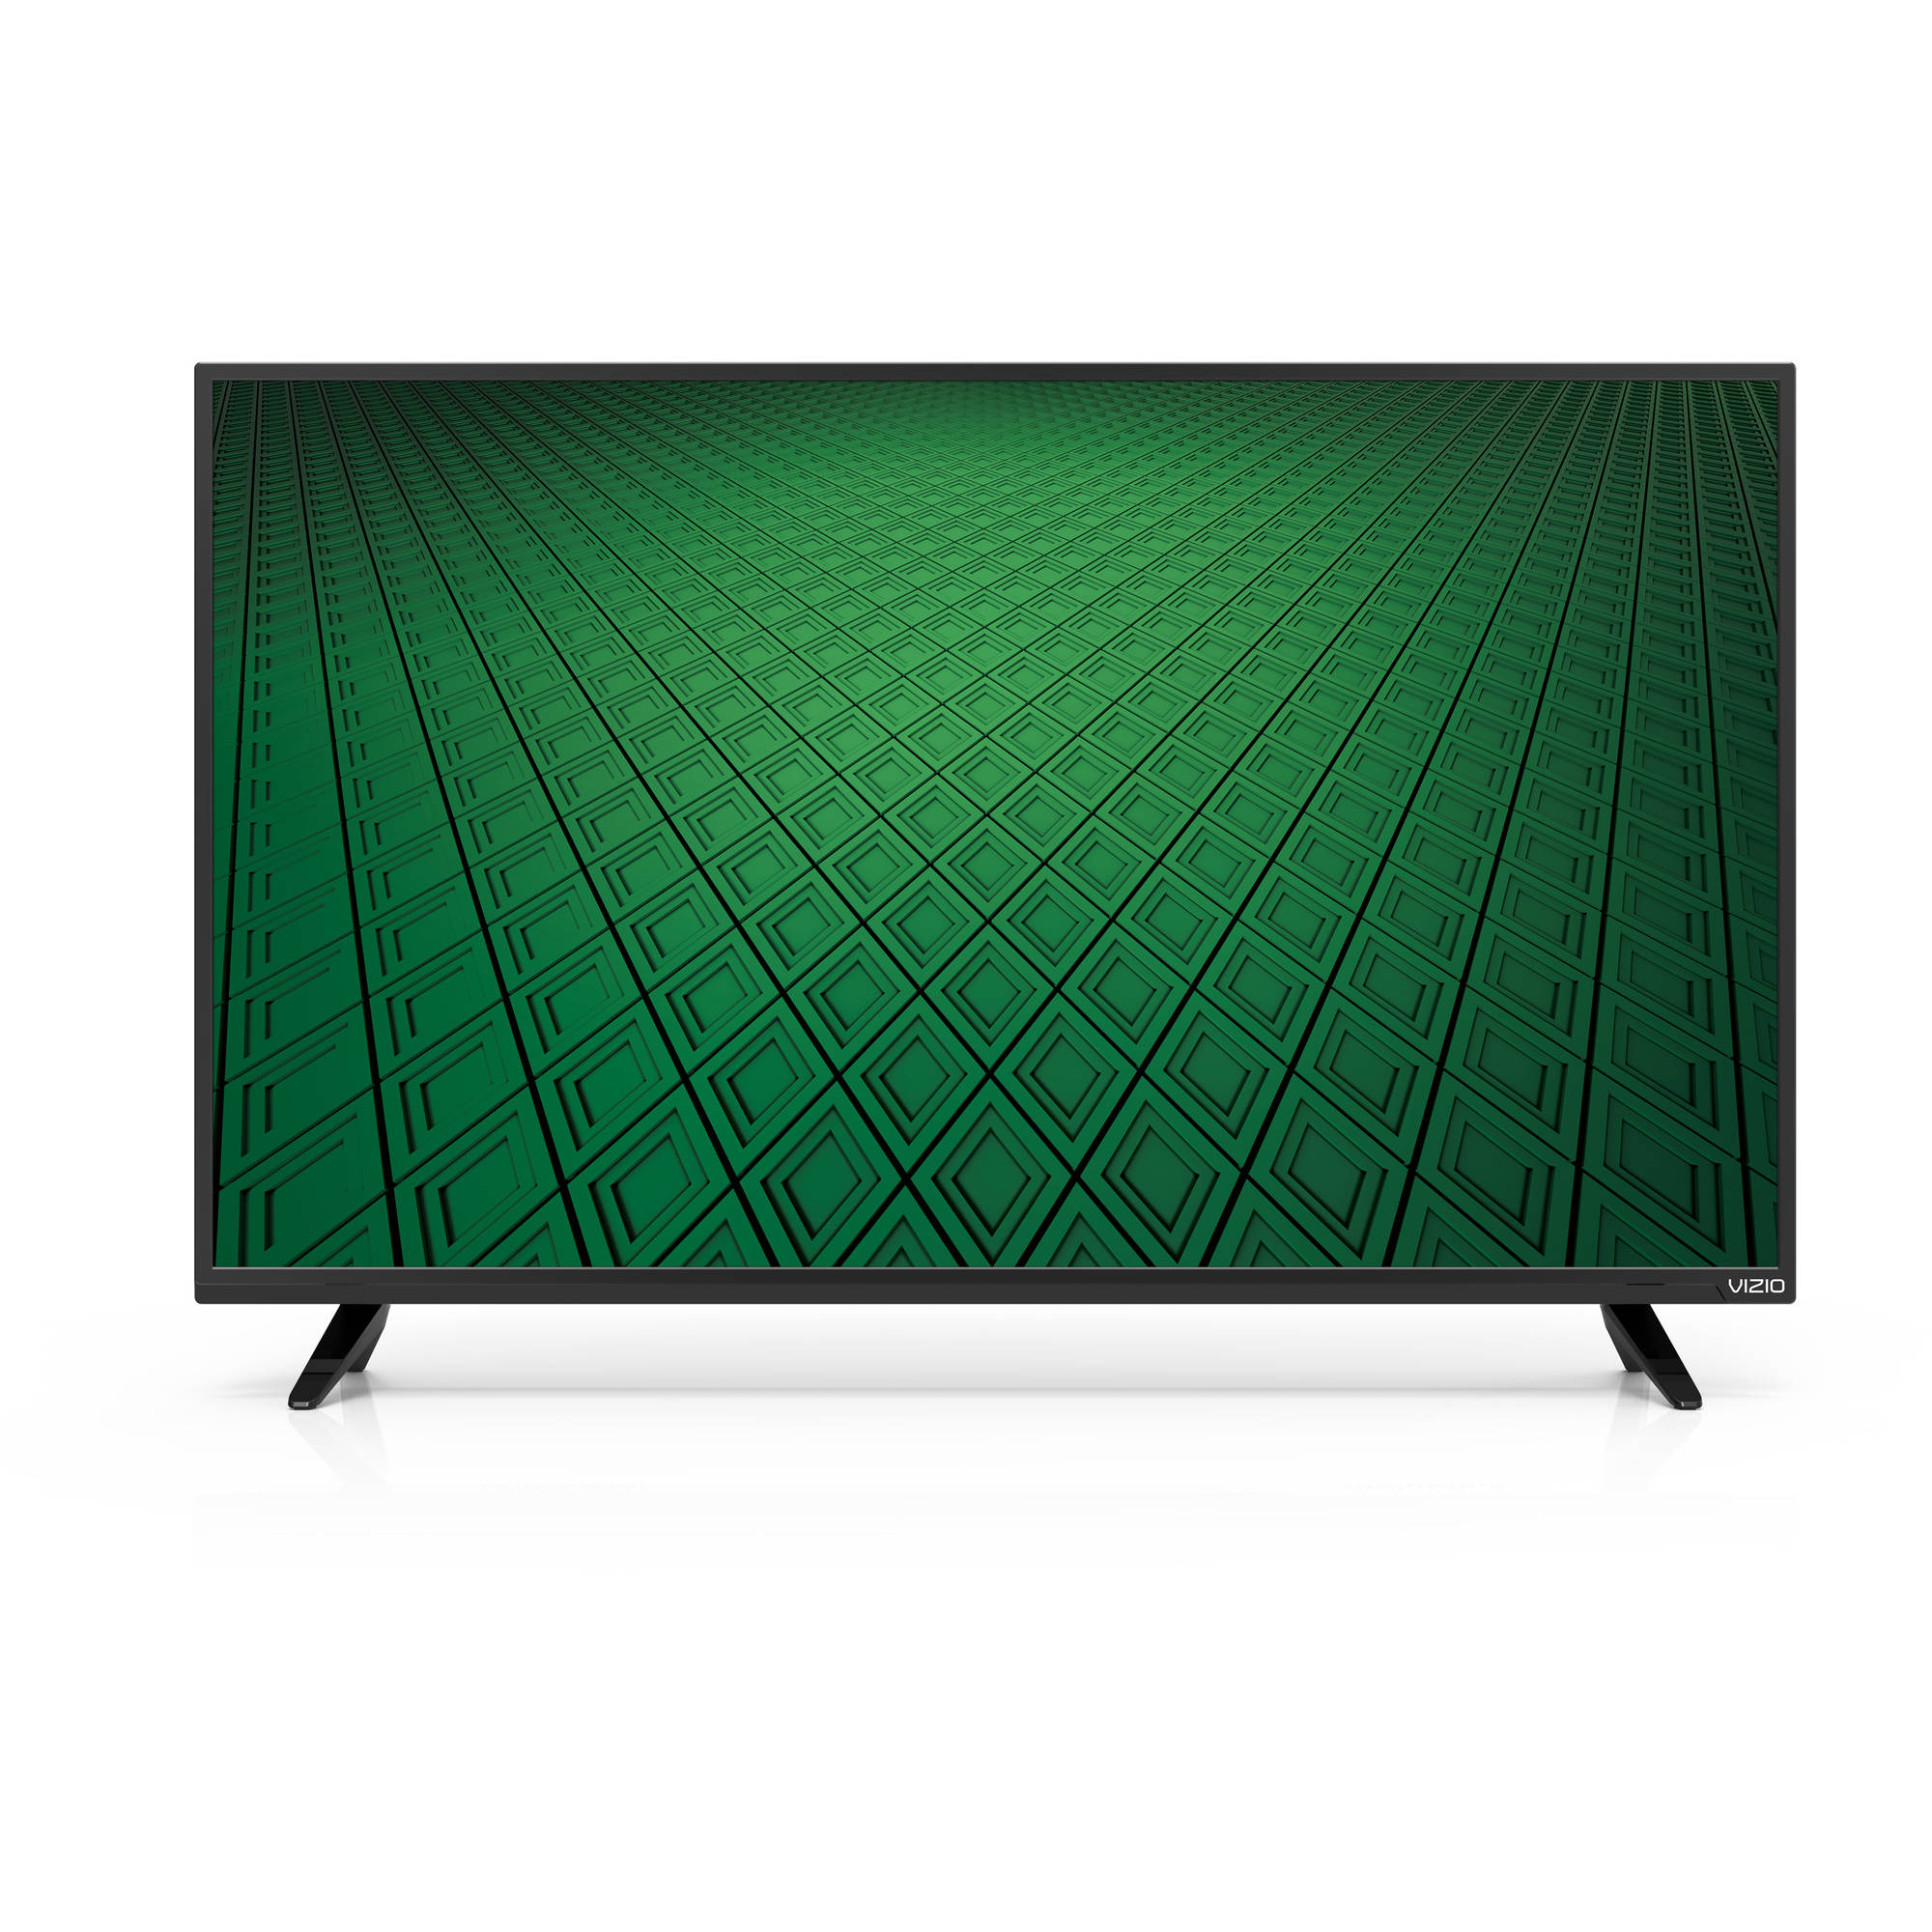 "Refurbished Vizio 39"" Class HD (720P) LED TV (D39hn-D0)"